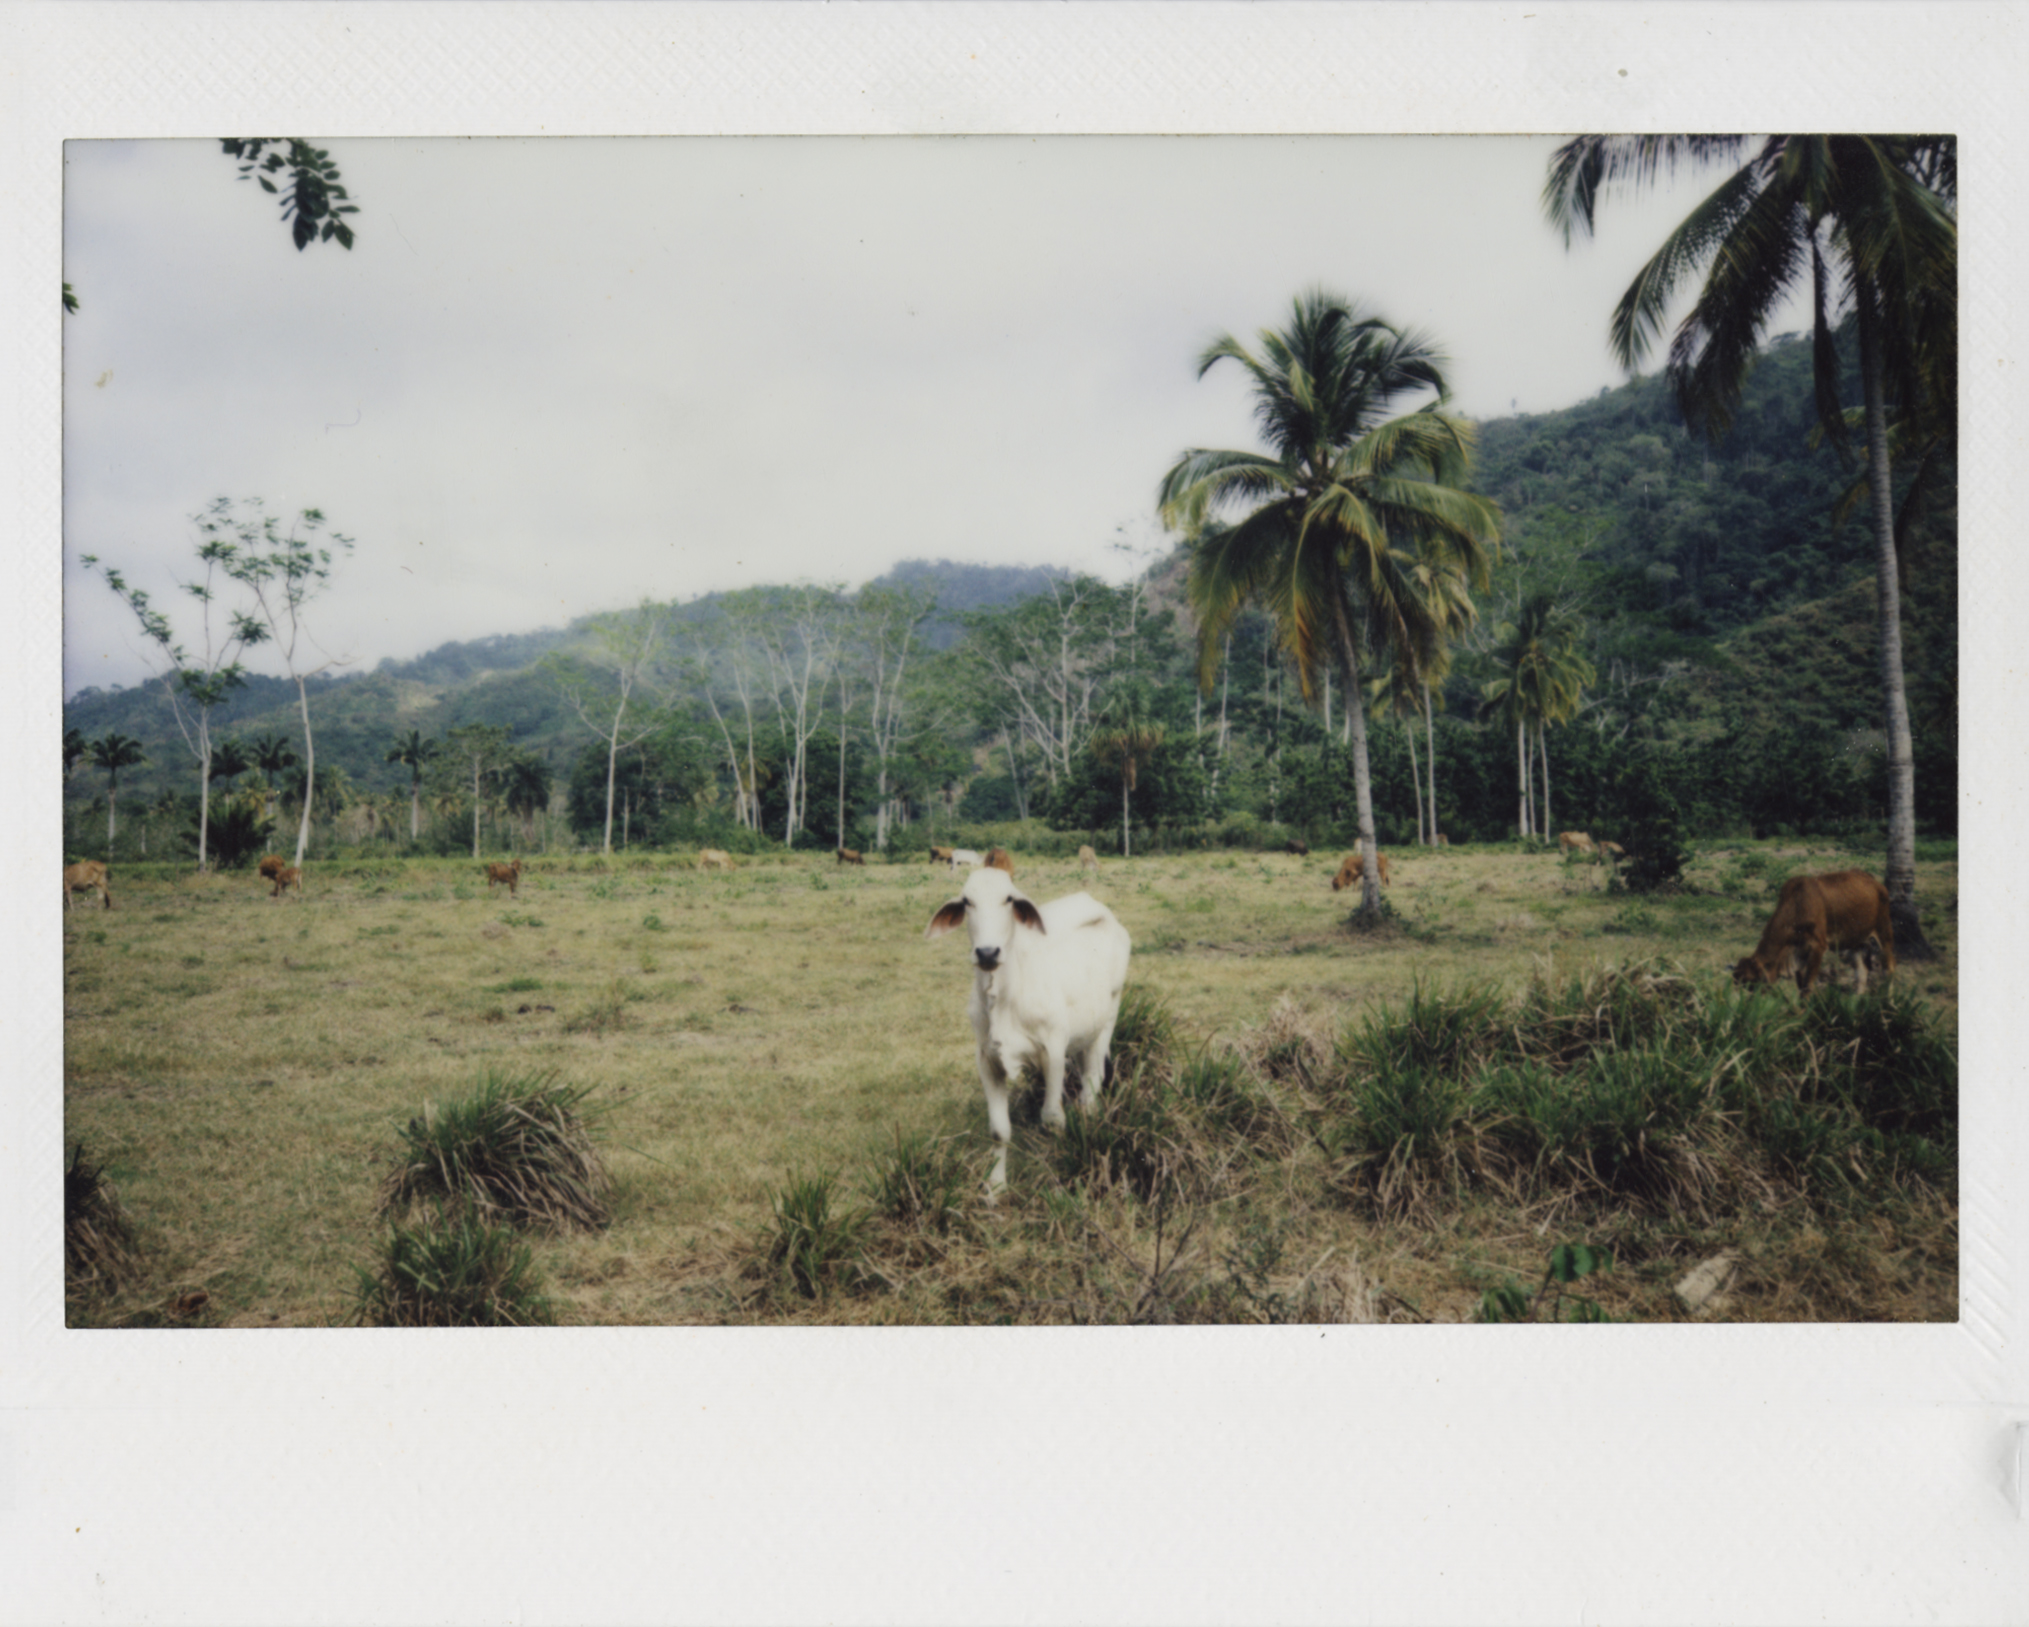 Colombia_03.jpg